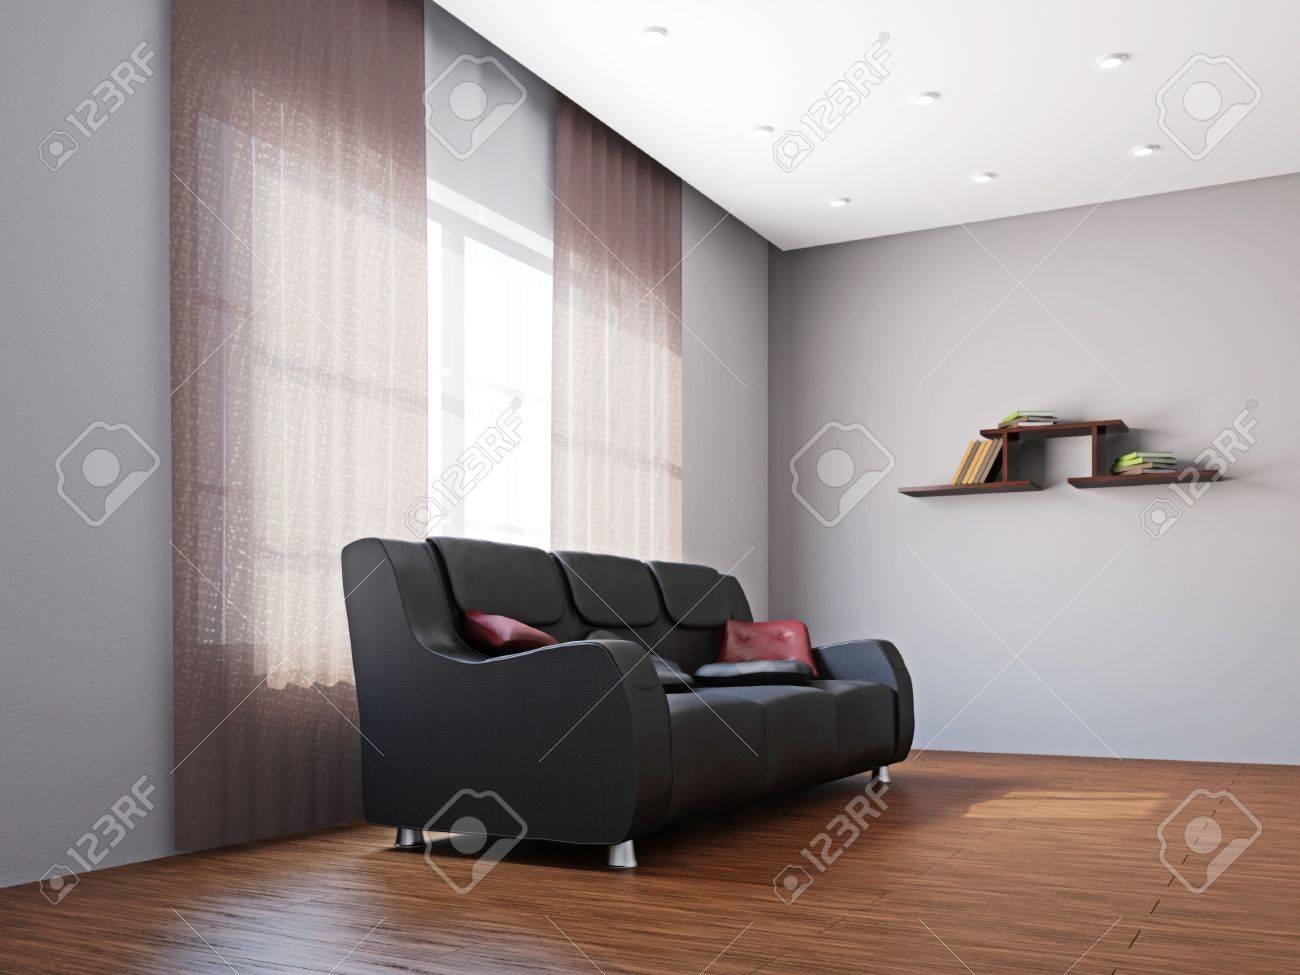 Big sofa in the livingroom near the window Stock Photo - 16659426